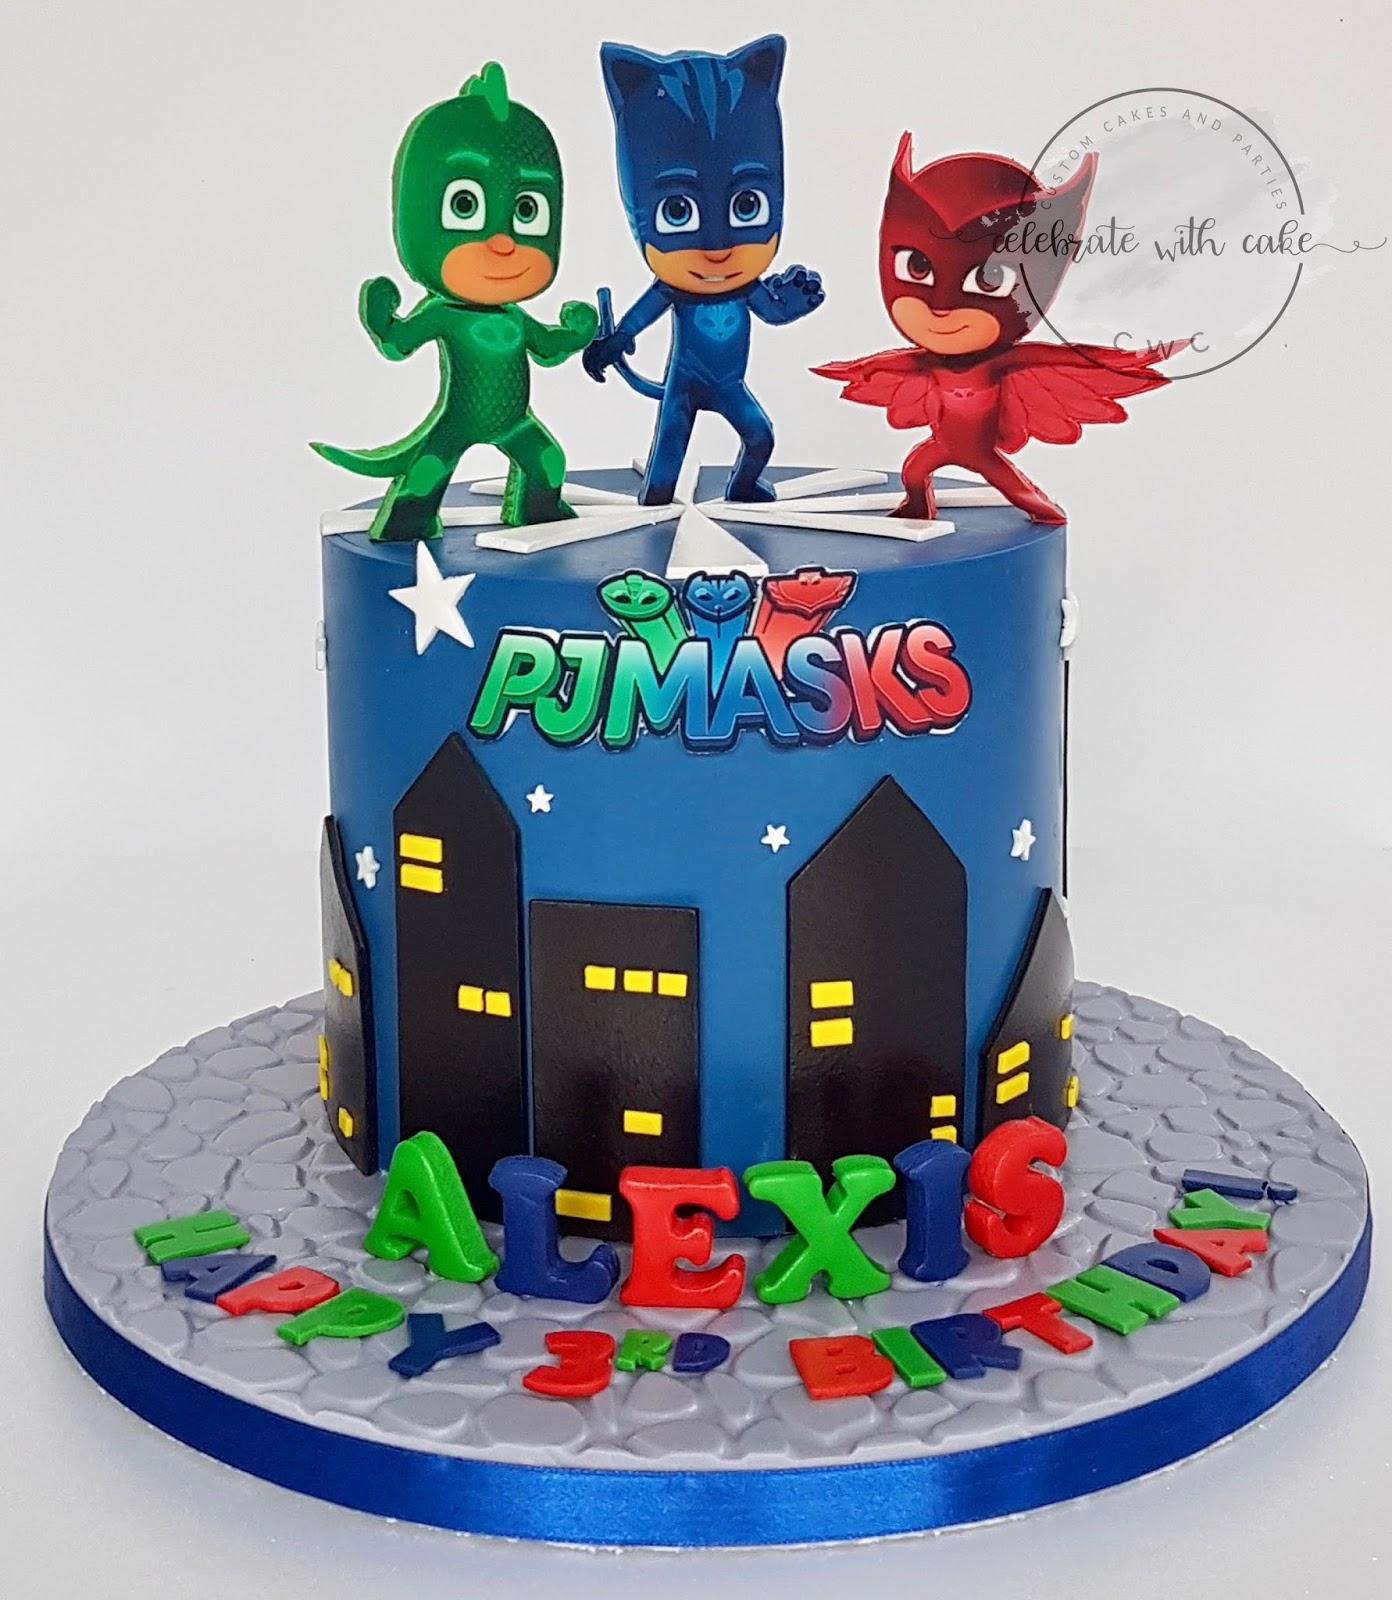 celebrate with cake pj masks single tier cake